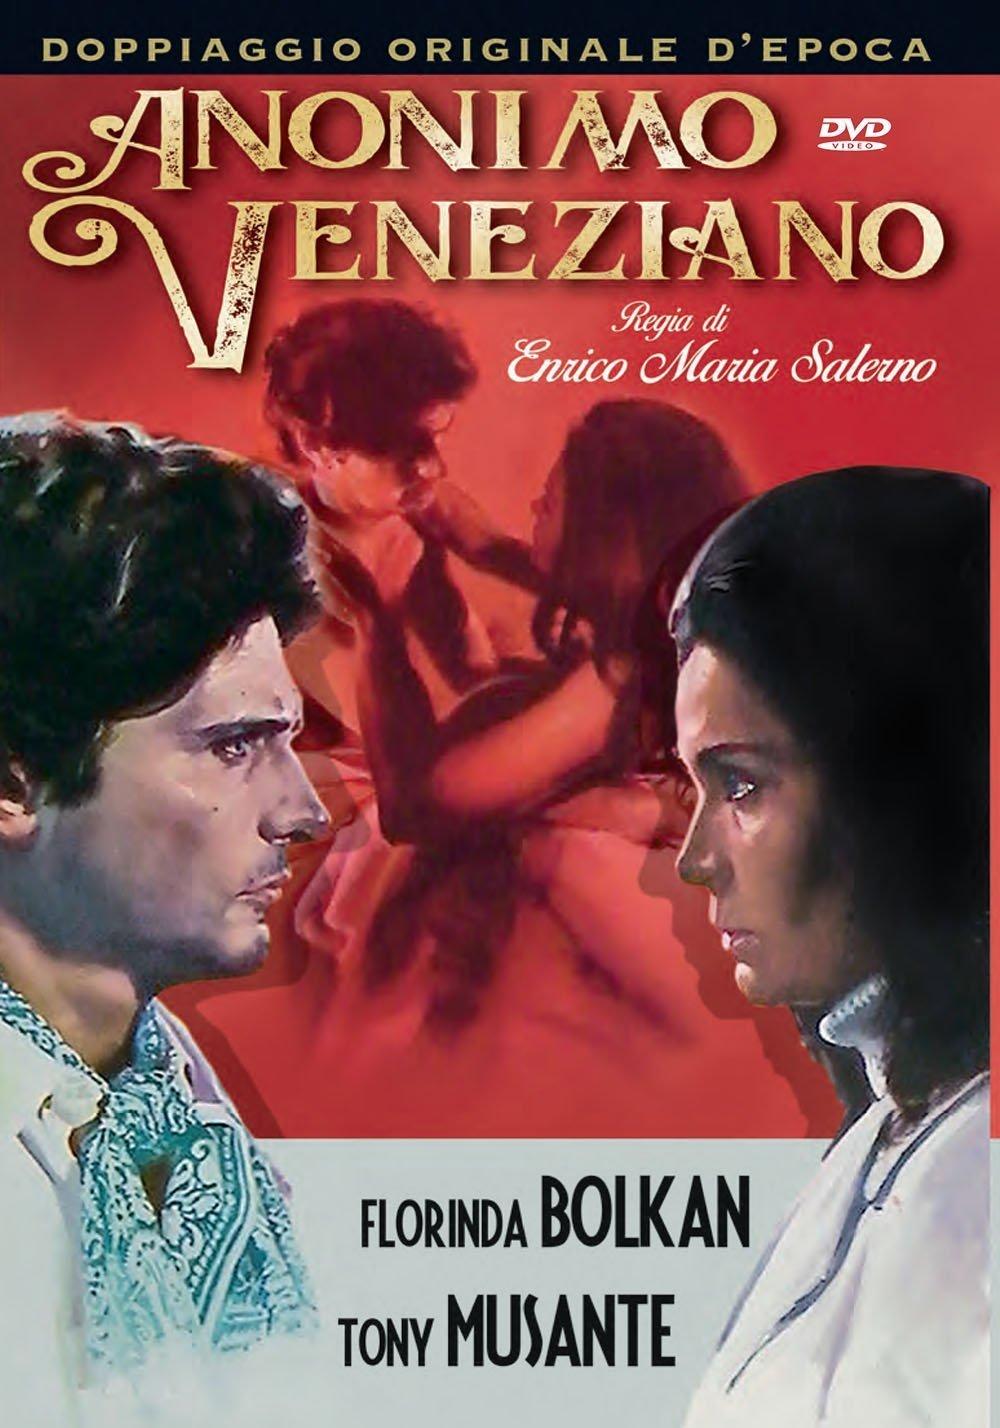 ANONIMO VENEZIANO (DVD)